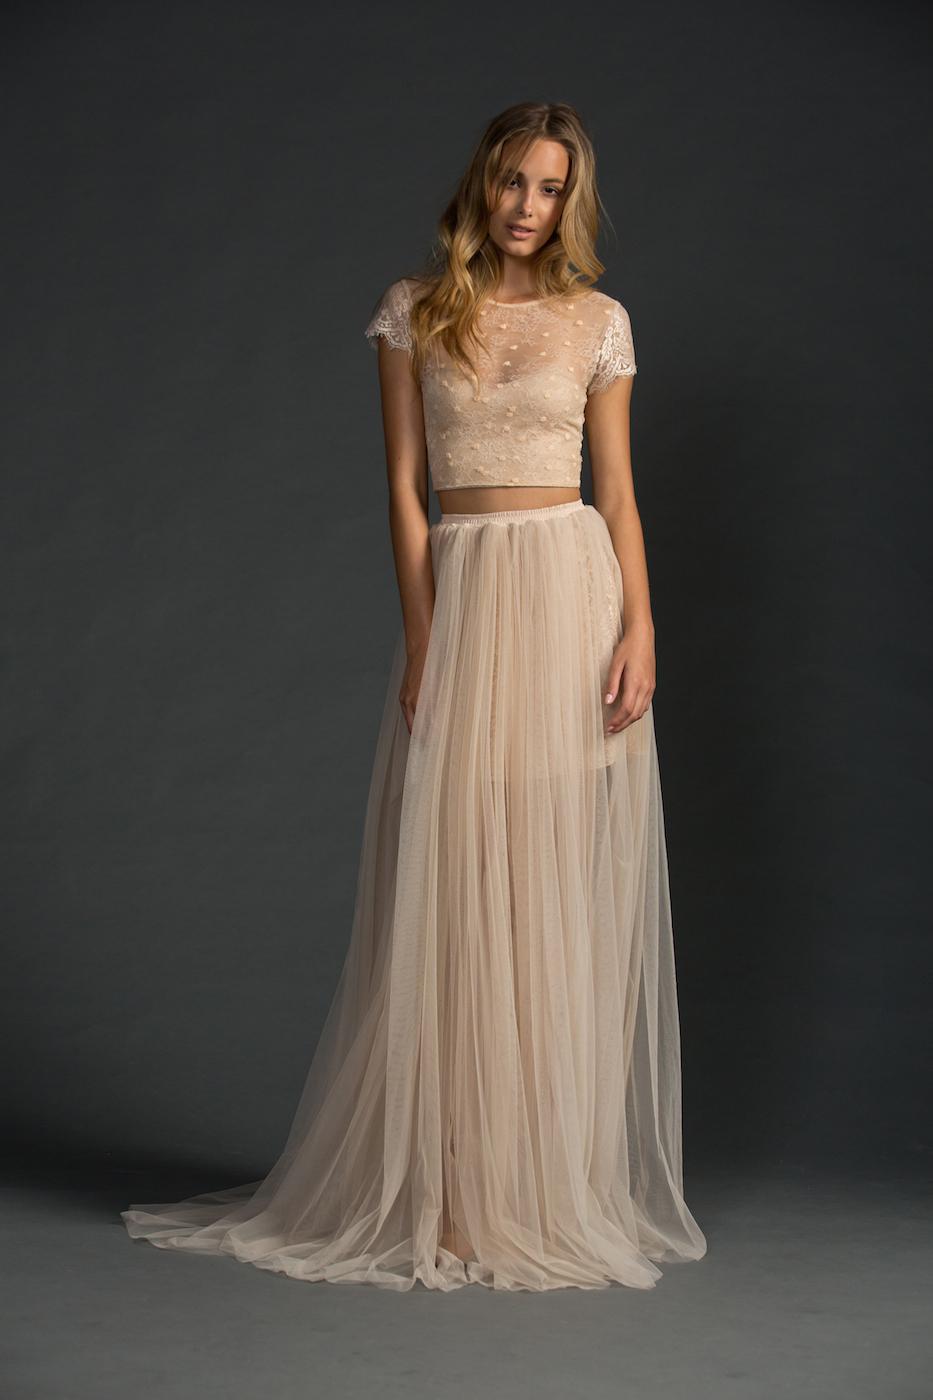 Francesca dress 900 wedding dresses for the bohemian for Boho wedding dresses australia